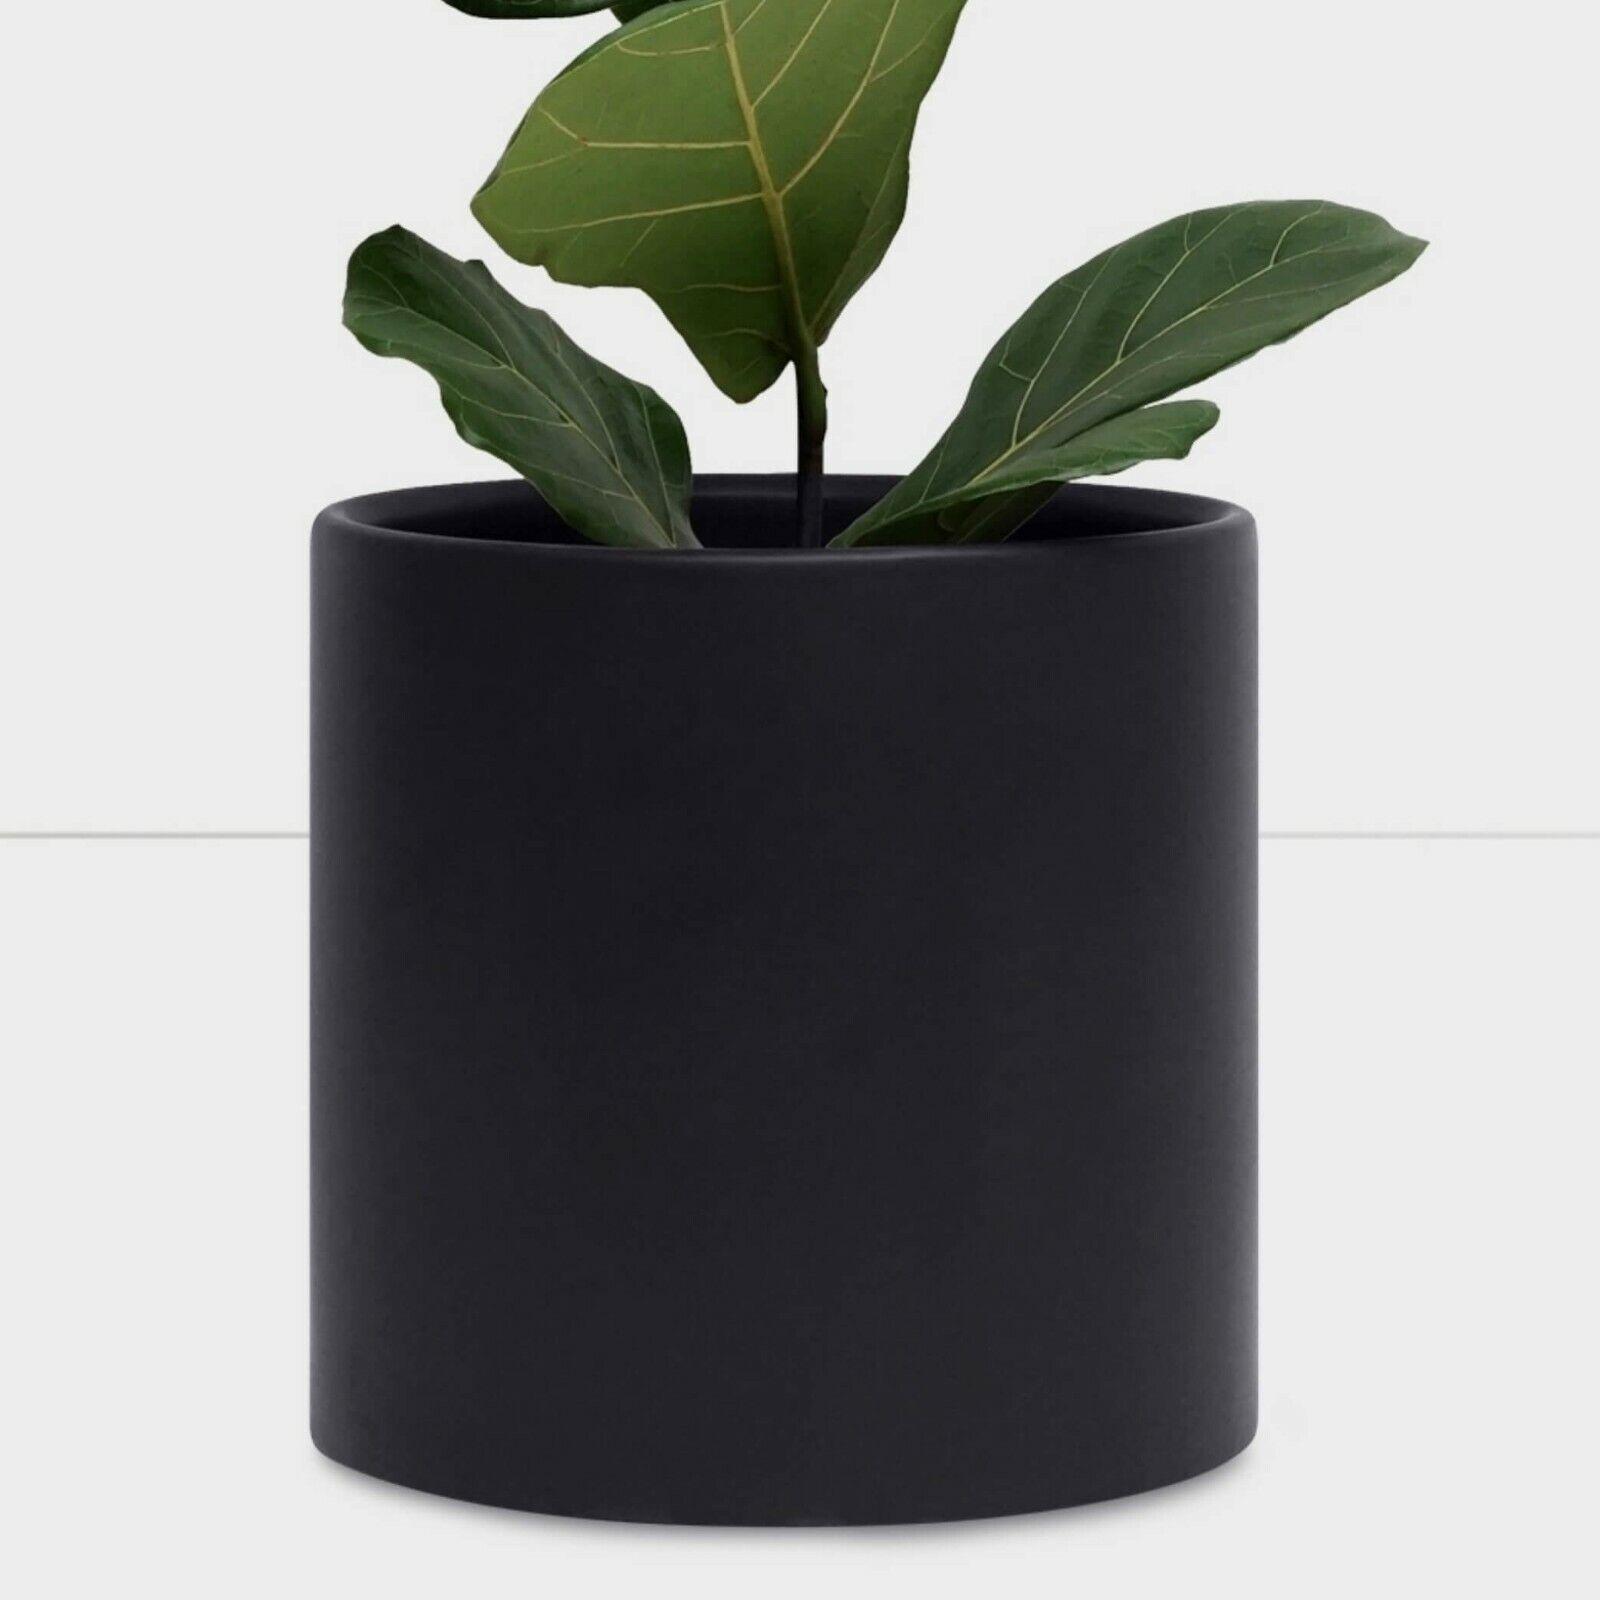 Large Black Plant Pot Modern Planter Ceramic Indoor Outdoor